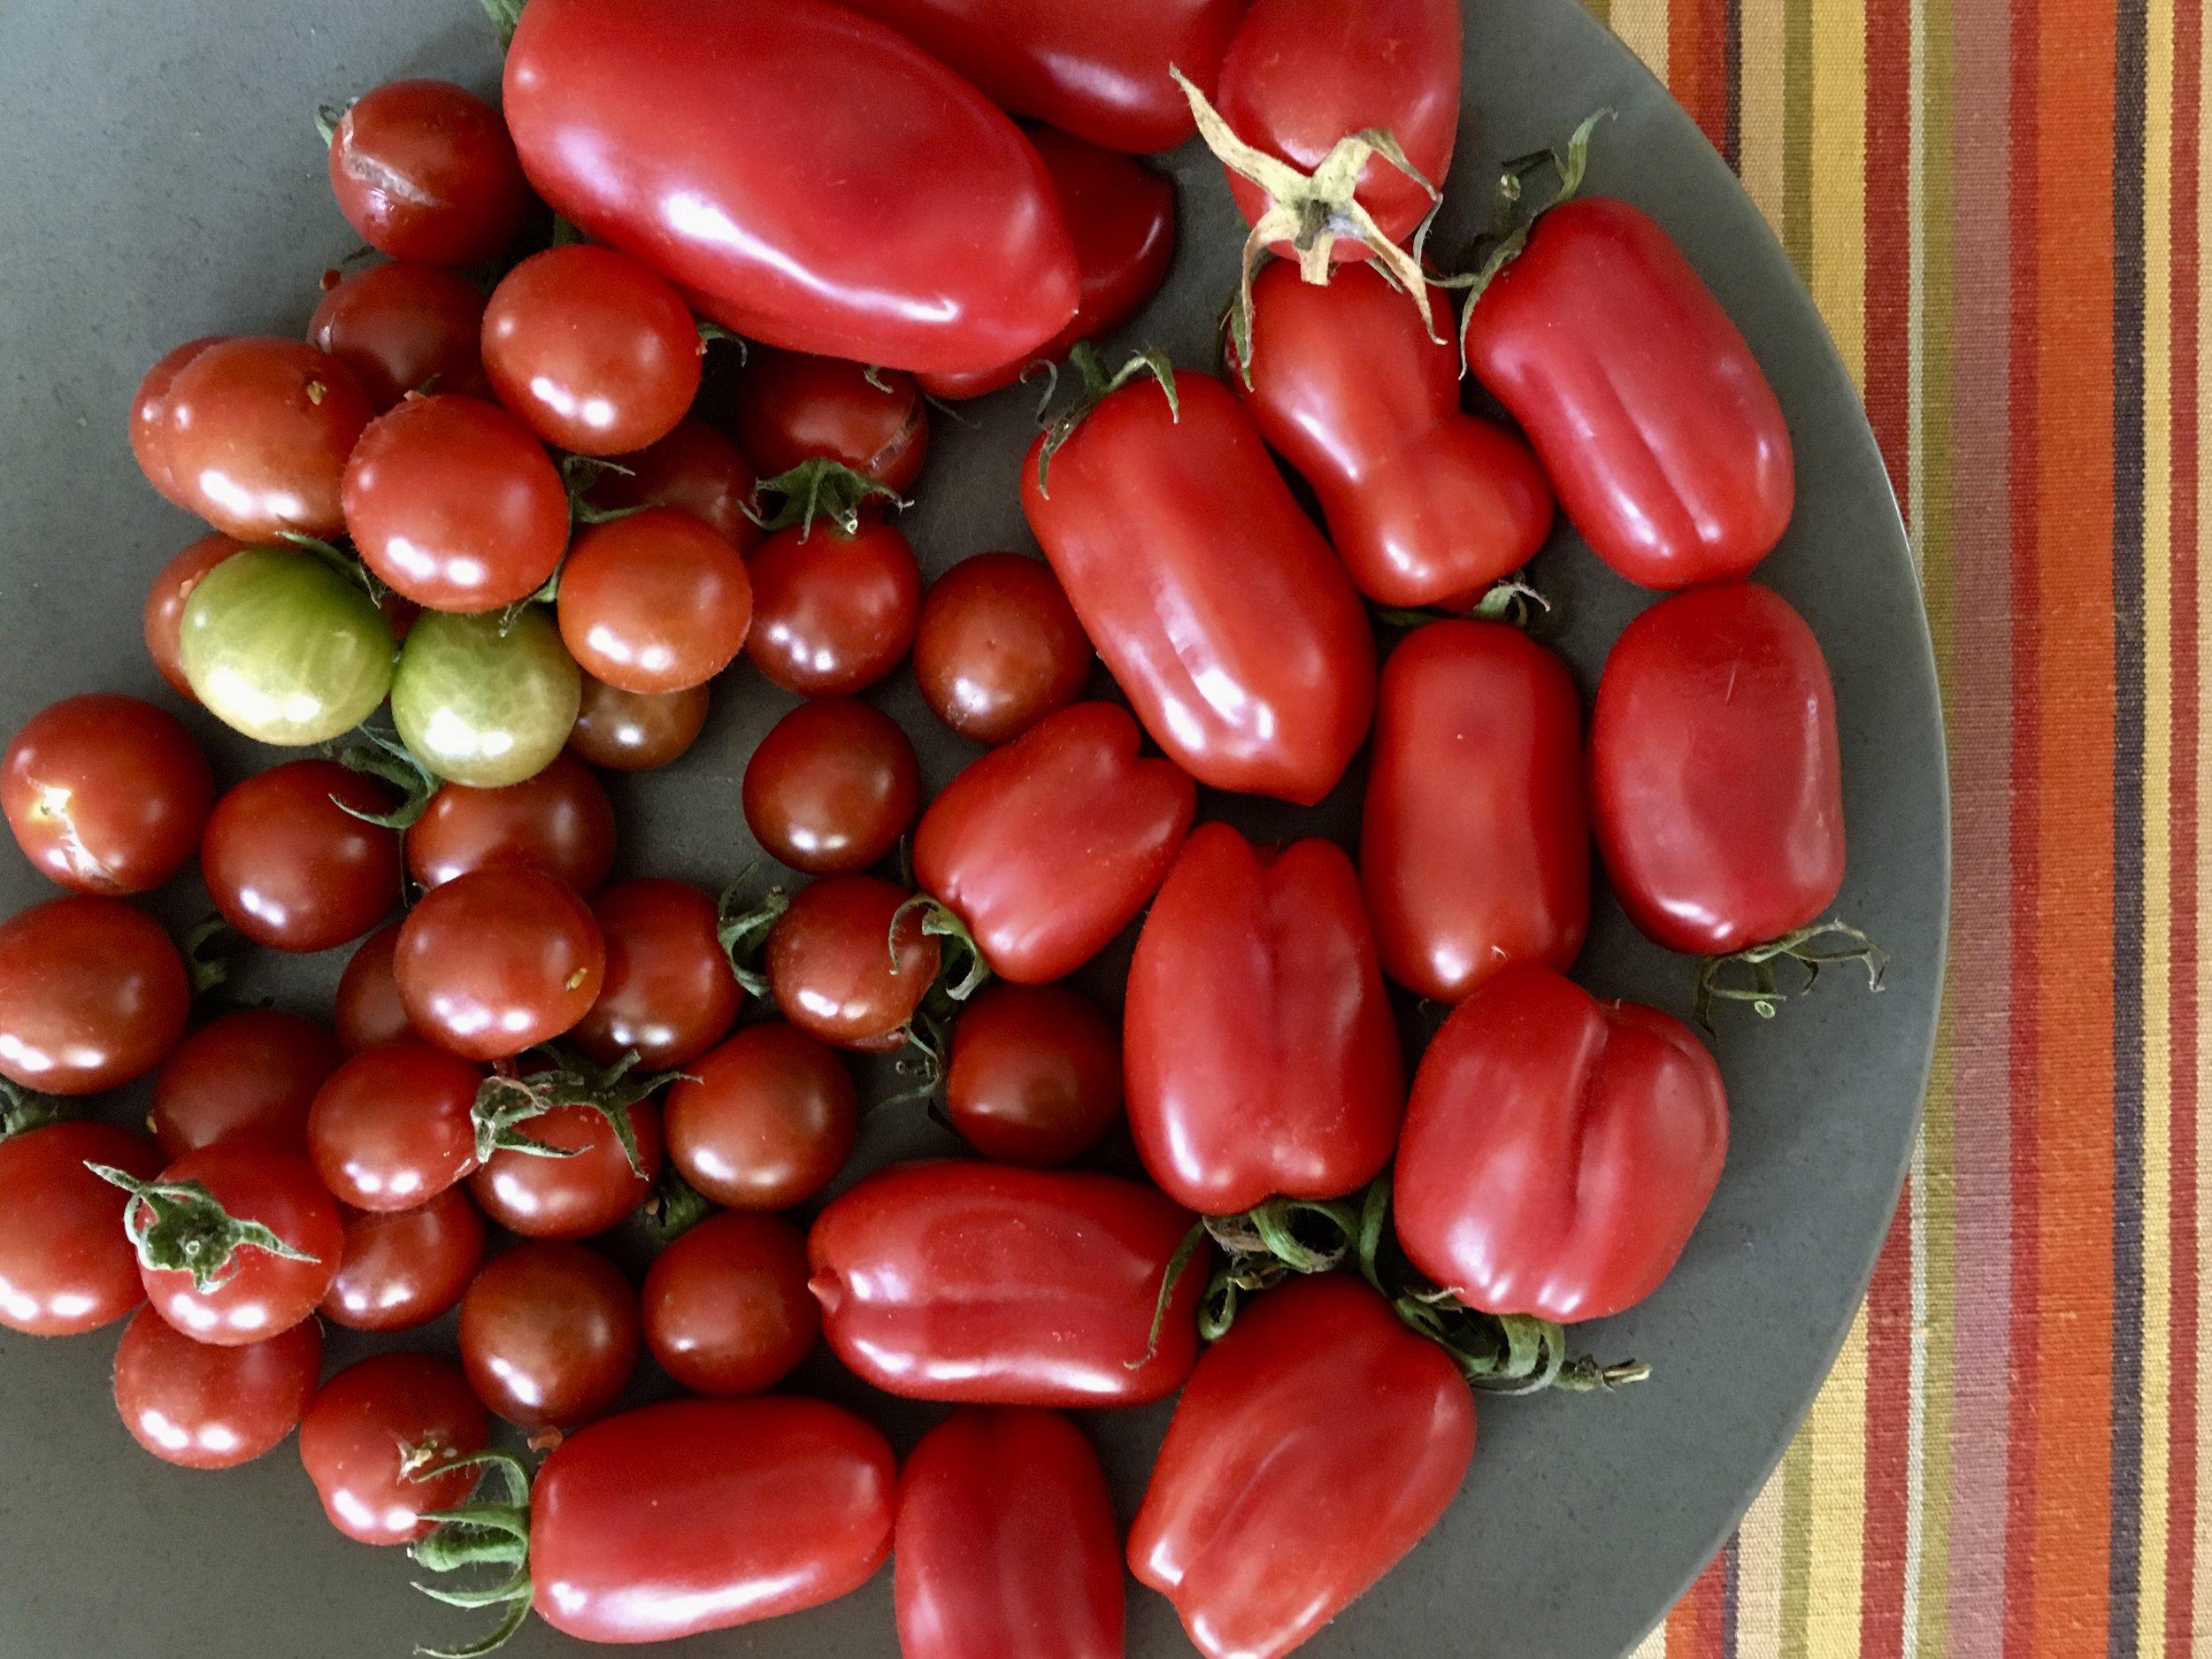 'Black Cherry' and 'San Marzano' tomatoes